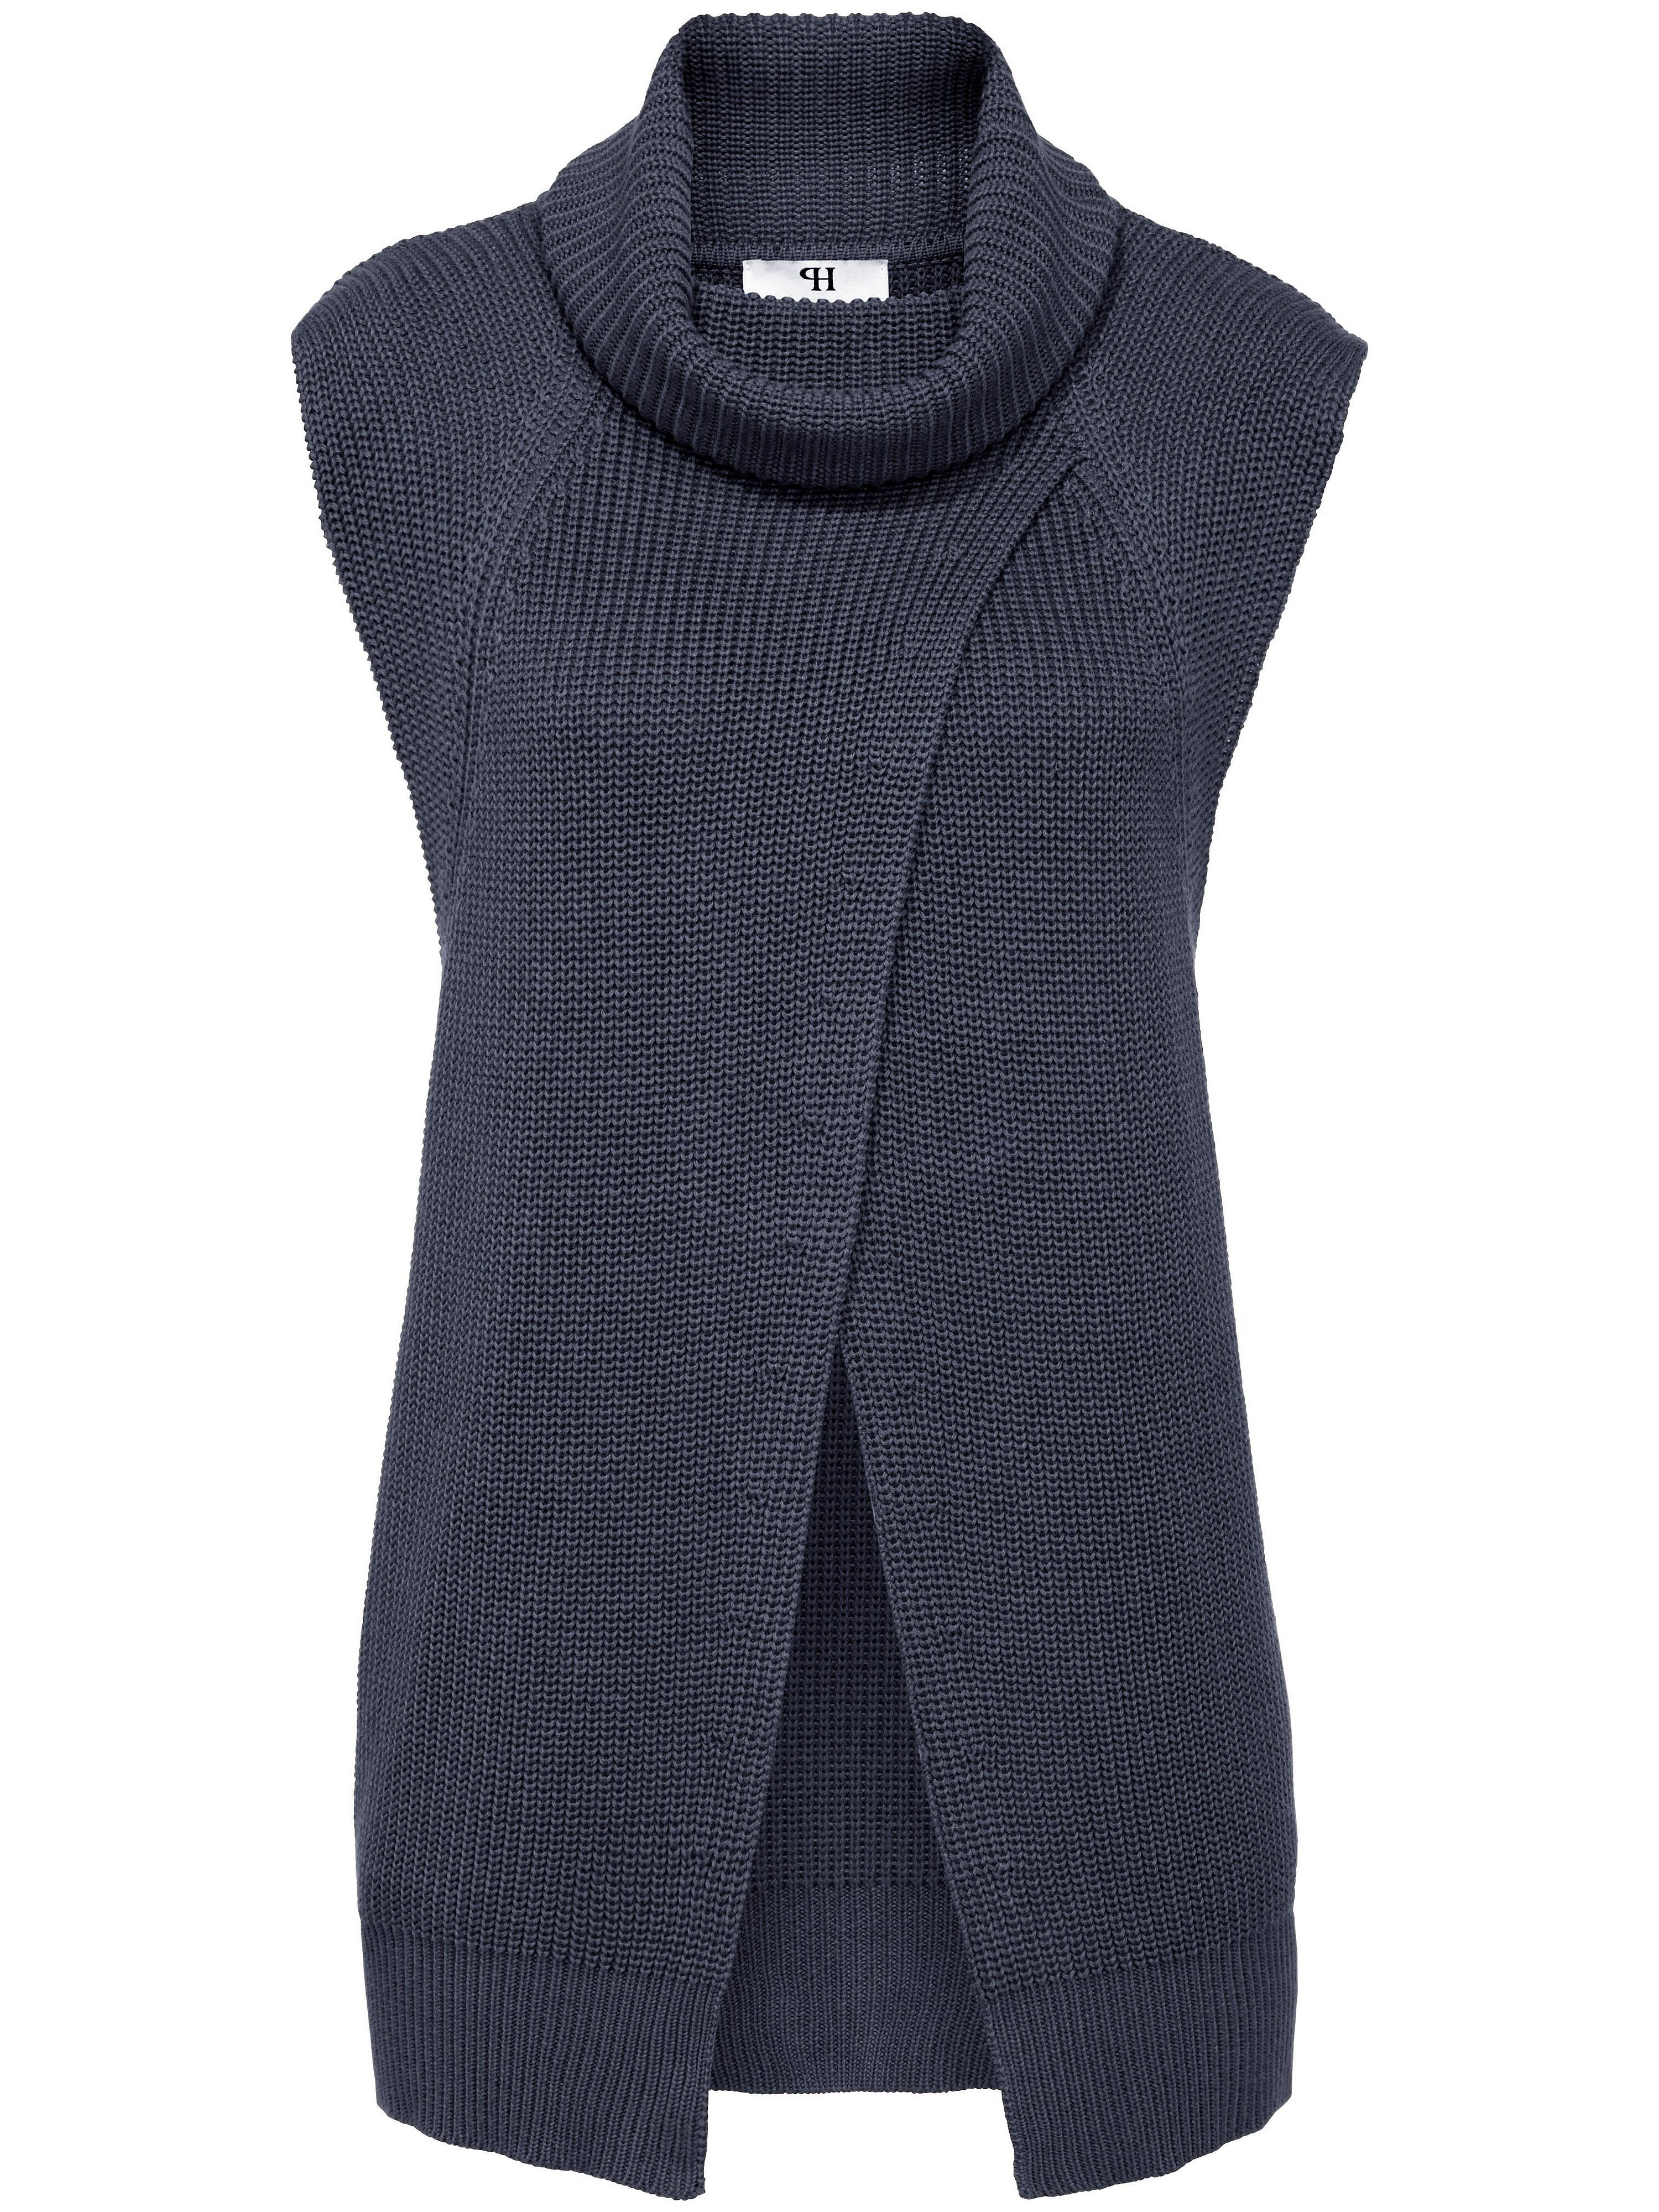 Pullunder Peter Hahn blau | Bekleidung > Pullover > Pullunder | Peter Hahn